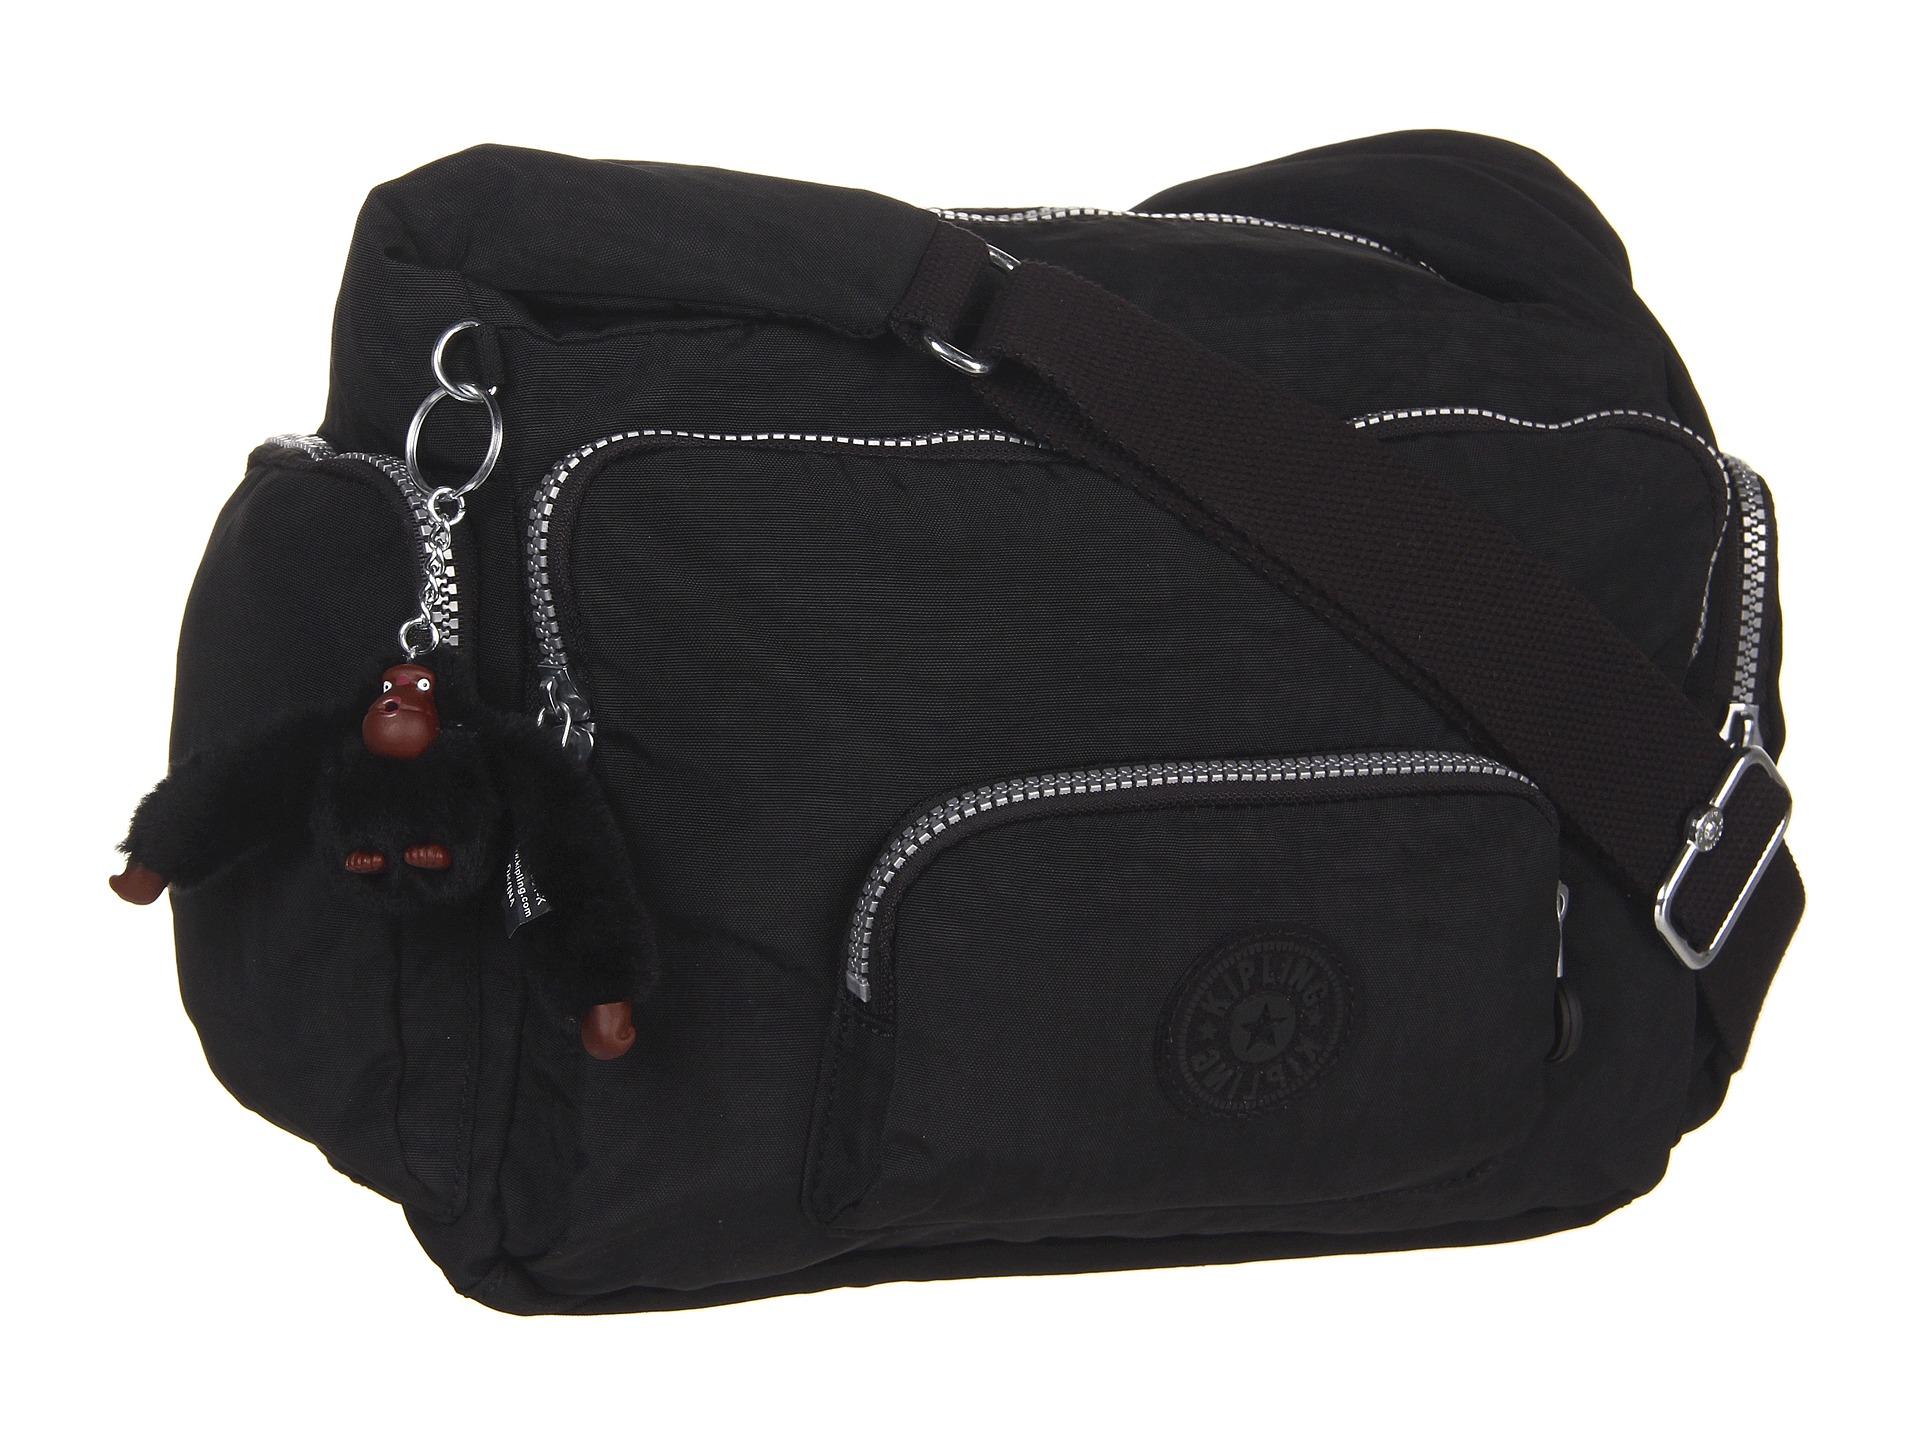 FREE SHIP Unisexual Genuine Leather Genuine Leather Shoulder Bag Leather Messenger Bag Man Crossover Bag Leather